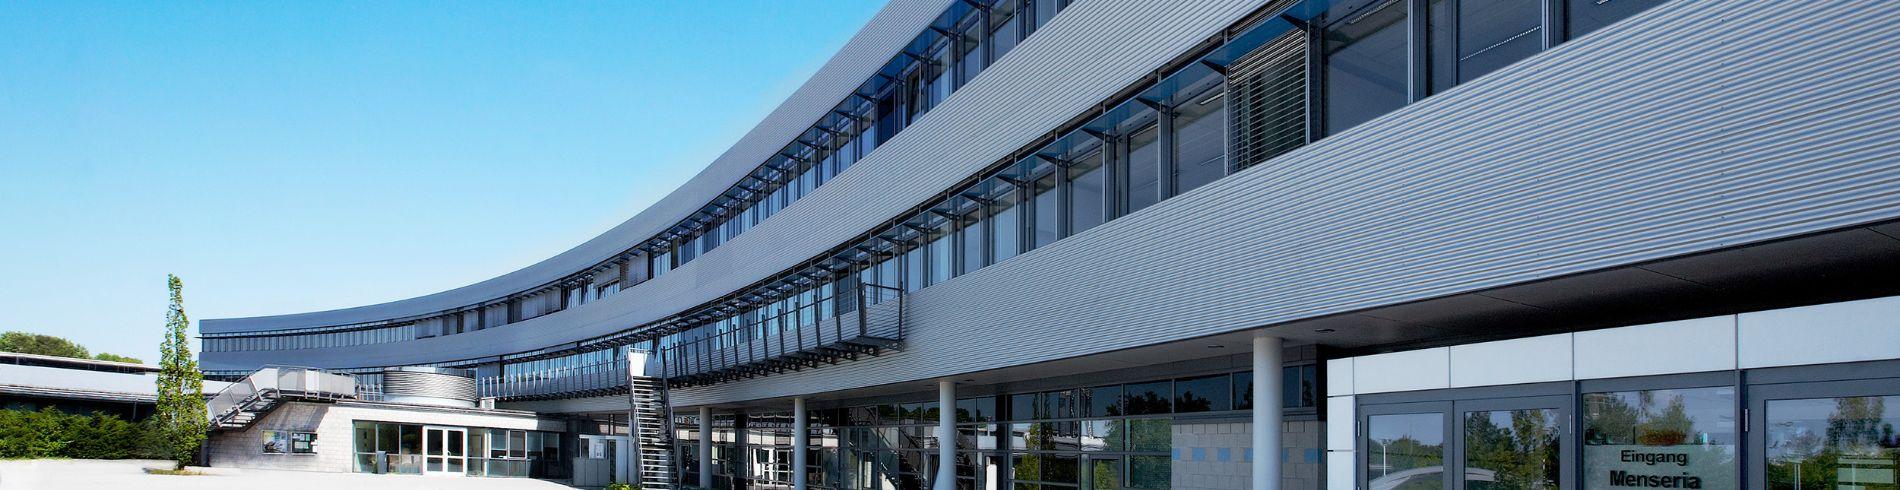 Pressebilder der Hochschule Koblenz cover image